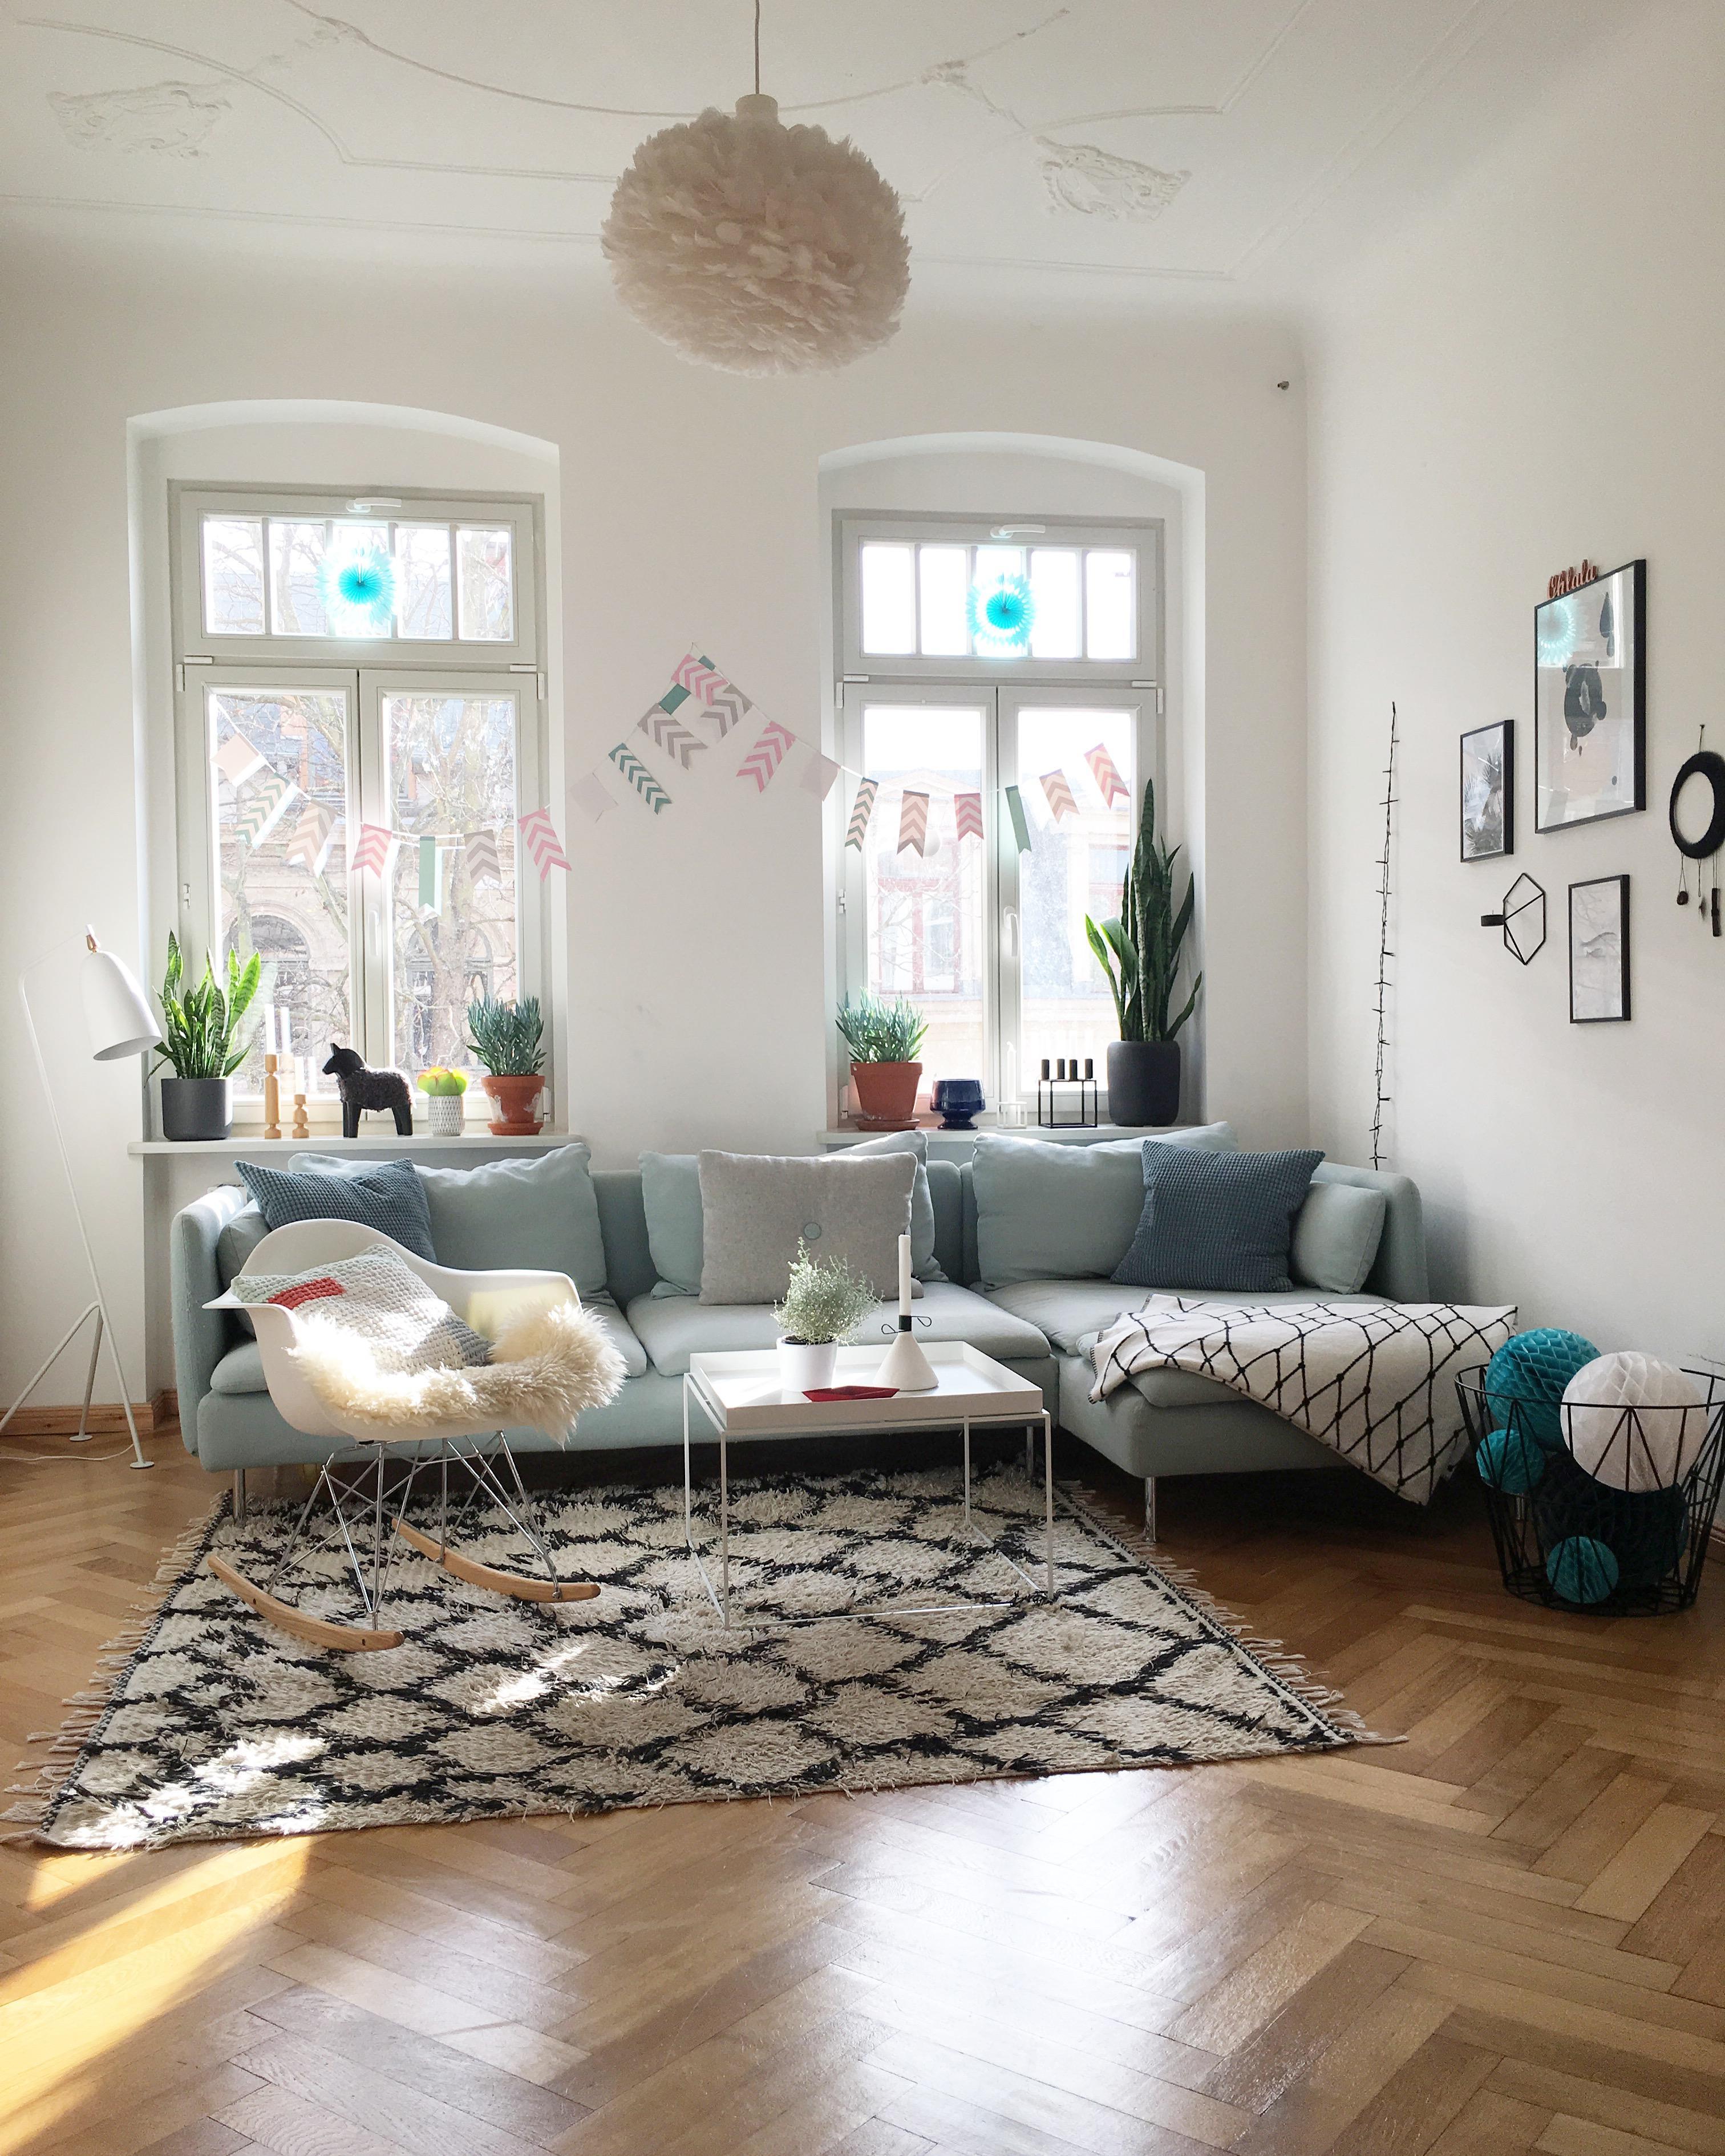 Teppich-Inspiration: Finde Ideen Bei COUCH